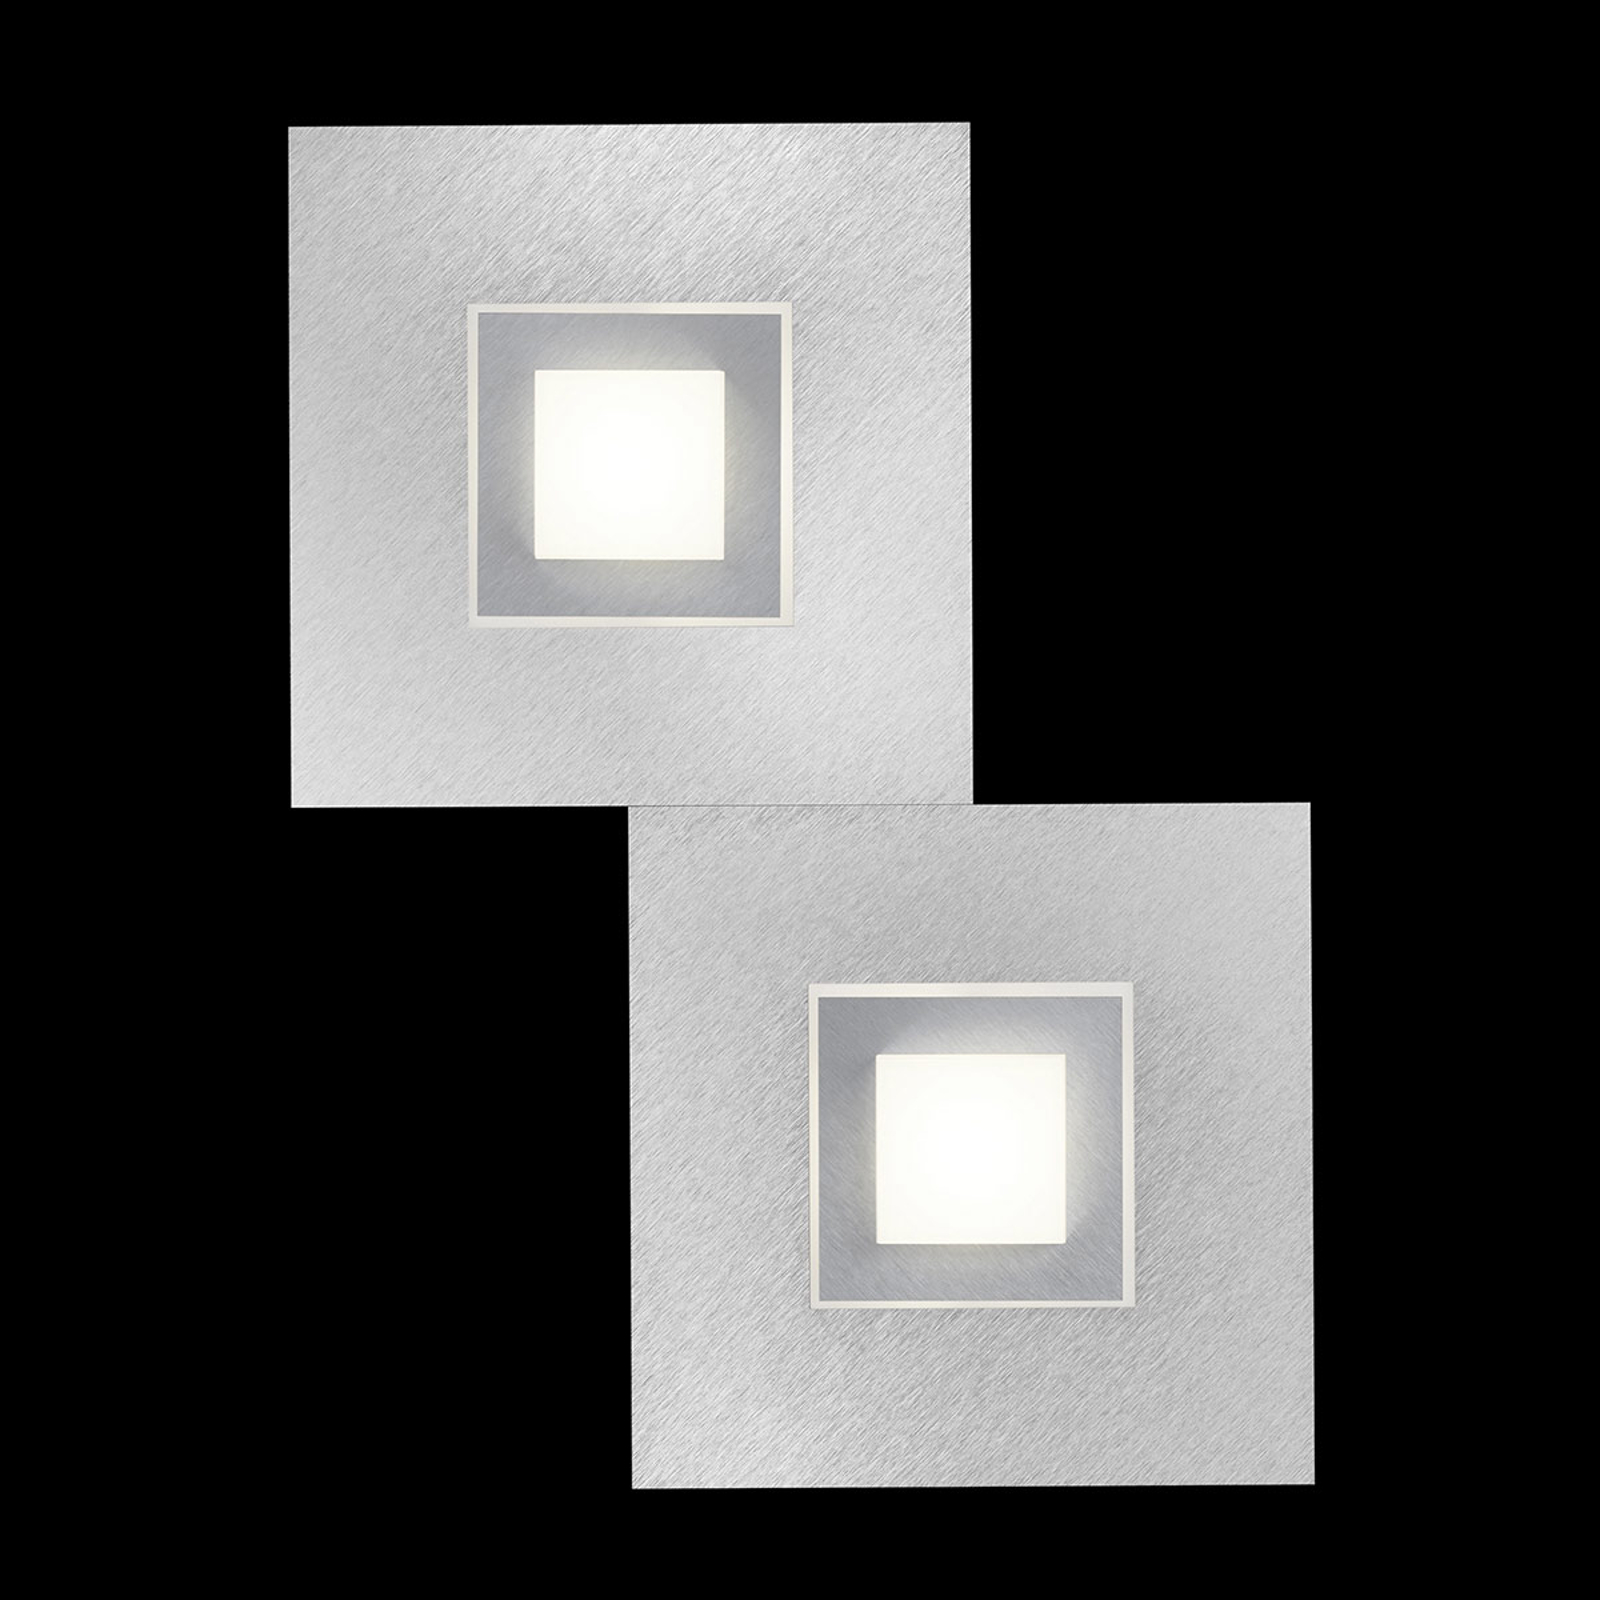 GROSSMANN Karree LED-Wandleuchte, 2fl. titan